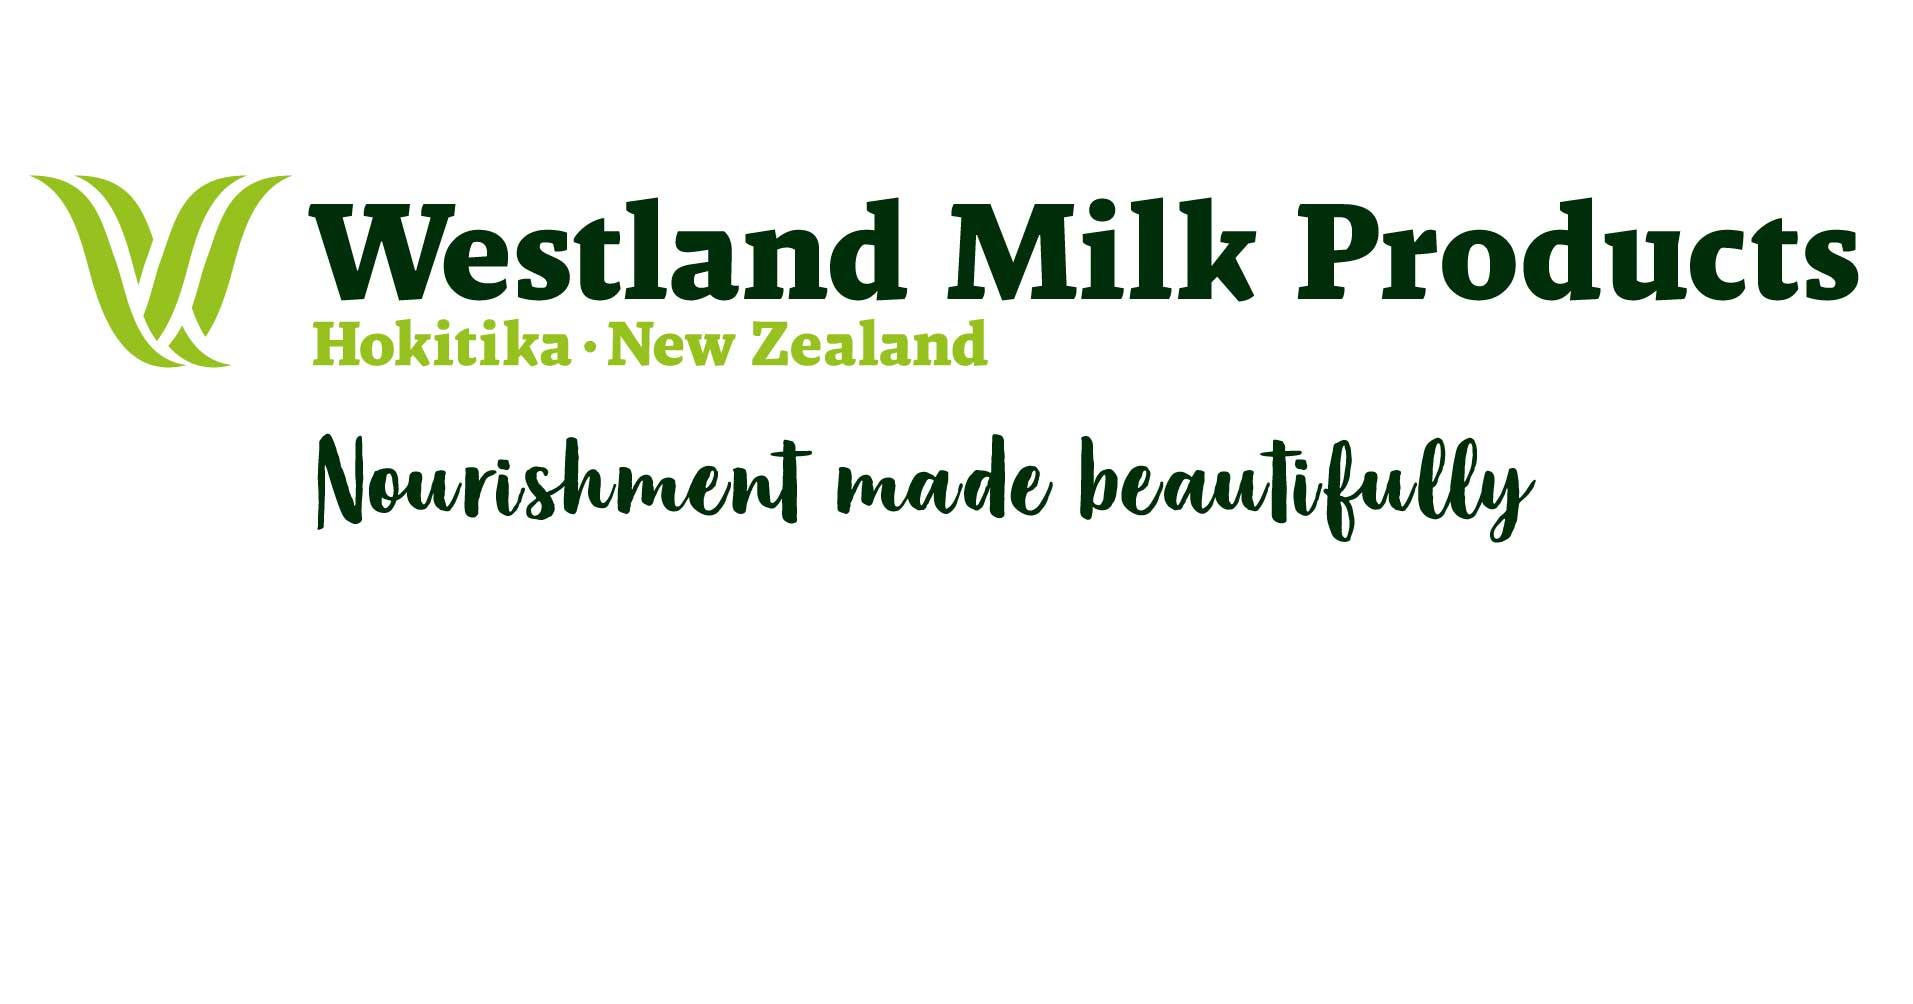 Westland Dairy Company